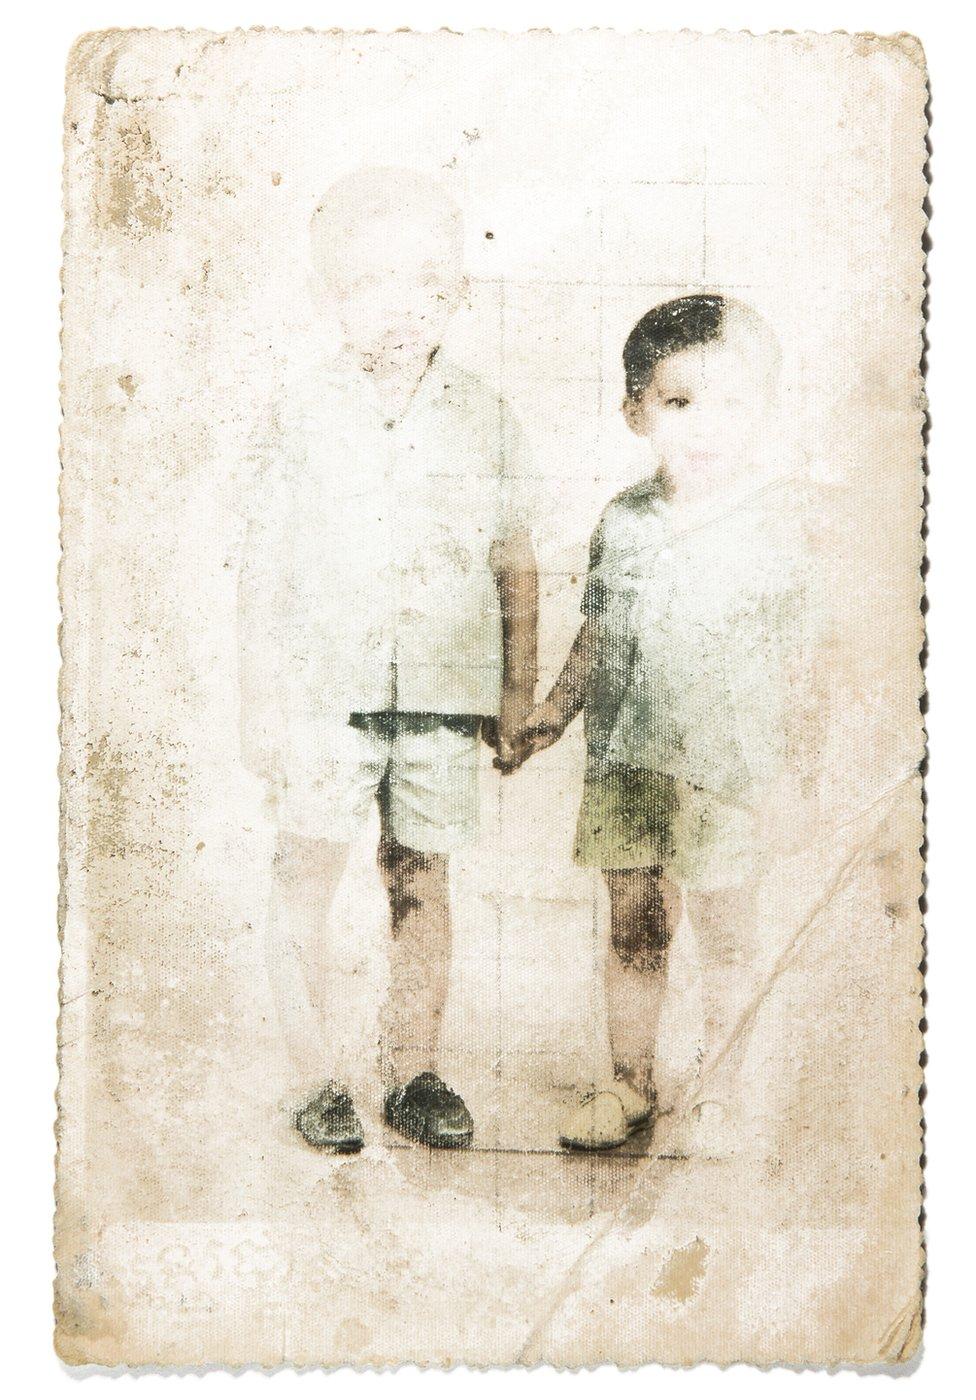 Vira (desno) drži za ruku brata Monirota